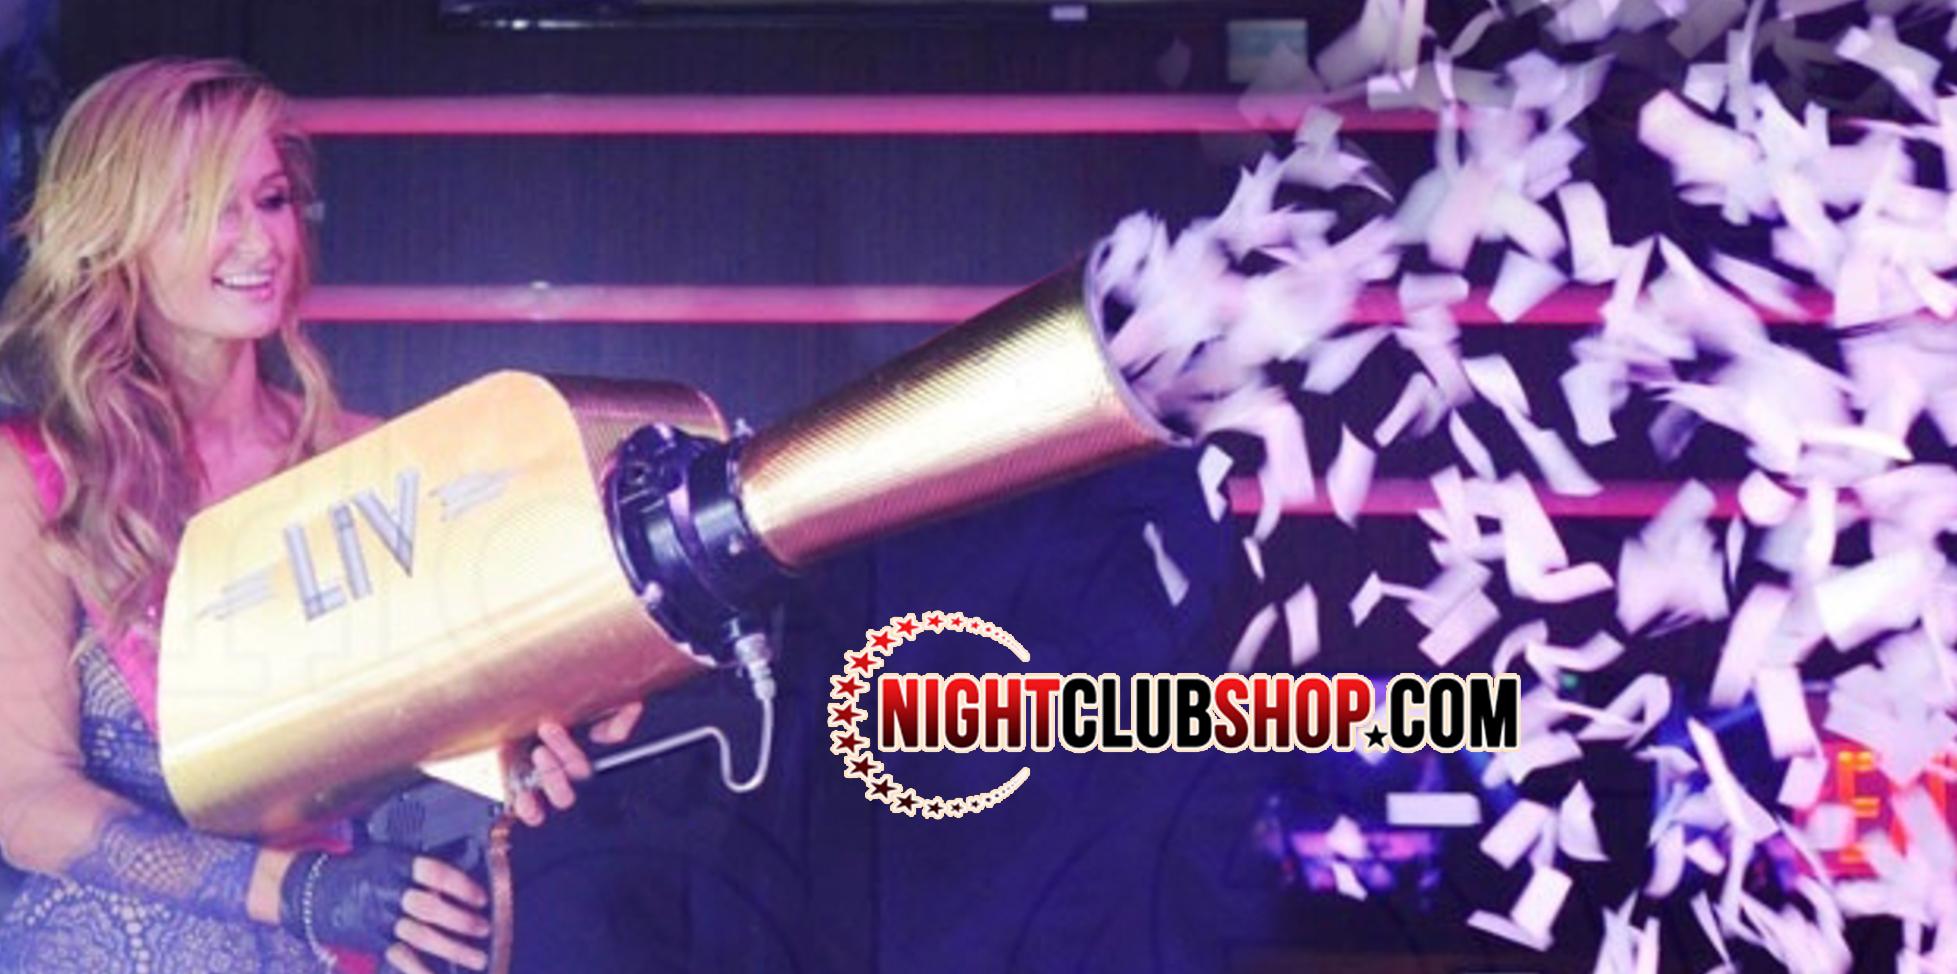 confetti-cannon-gun-blaster-launcher-co2-gerb-custom-nightclubshop.jpg